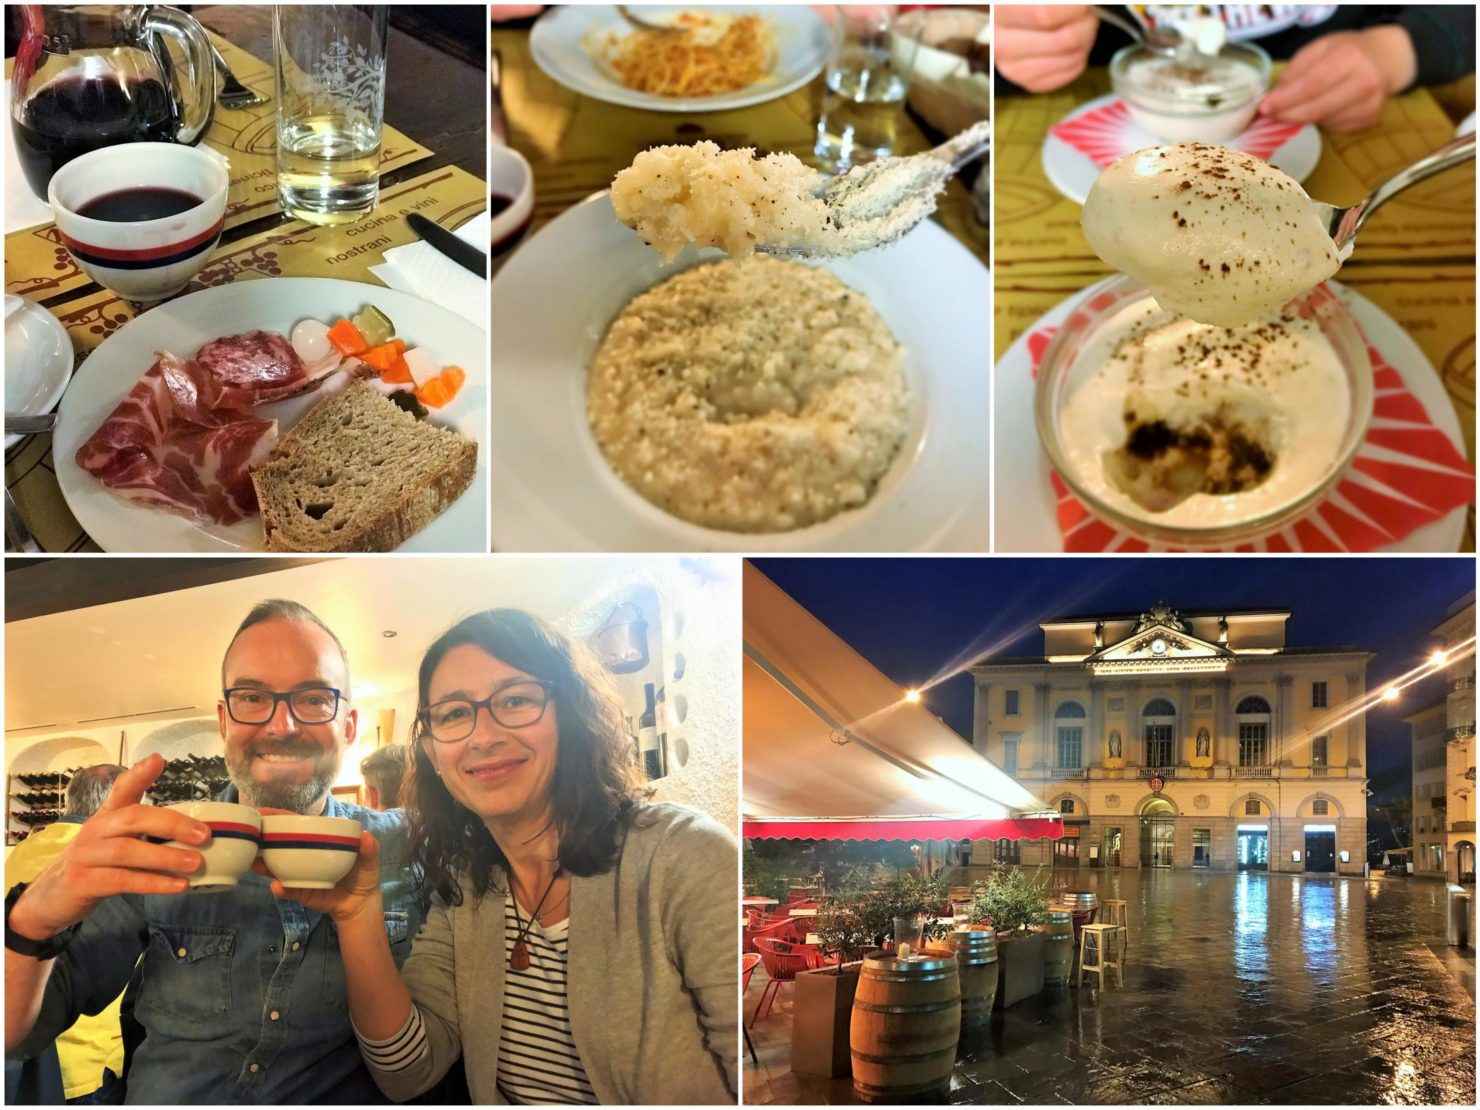 Familien Wochenende in Lugano im Tessin